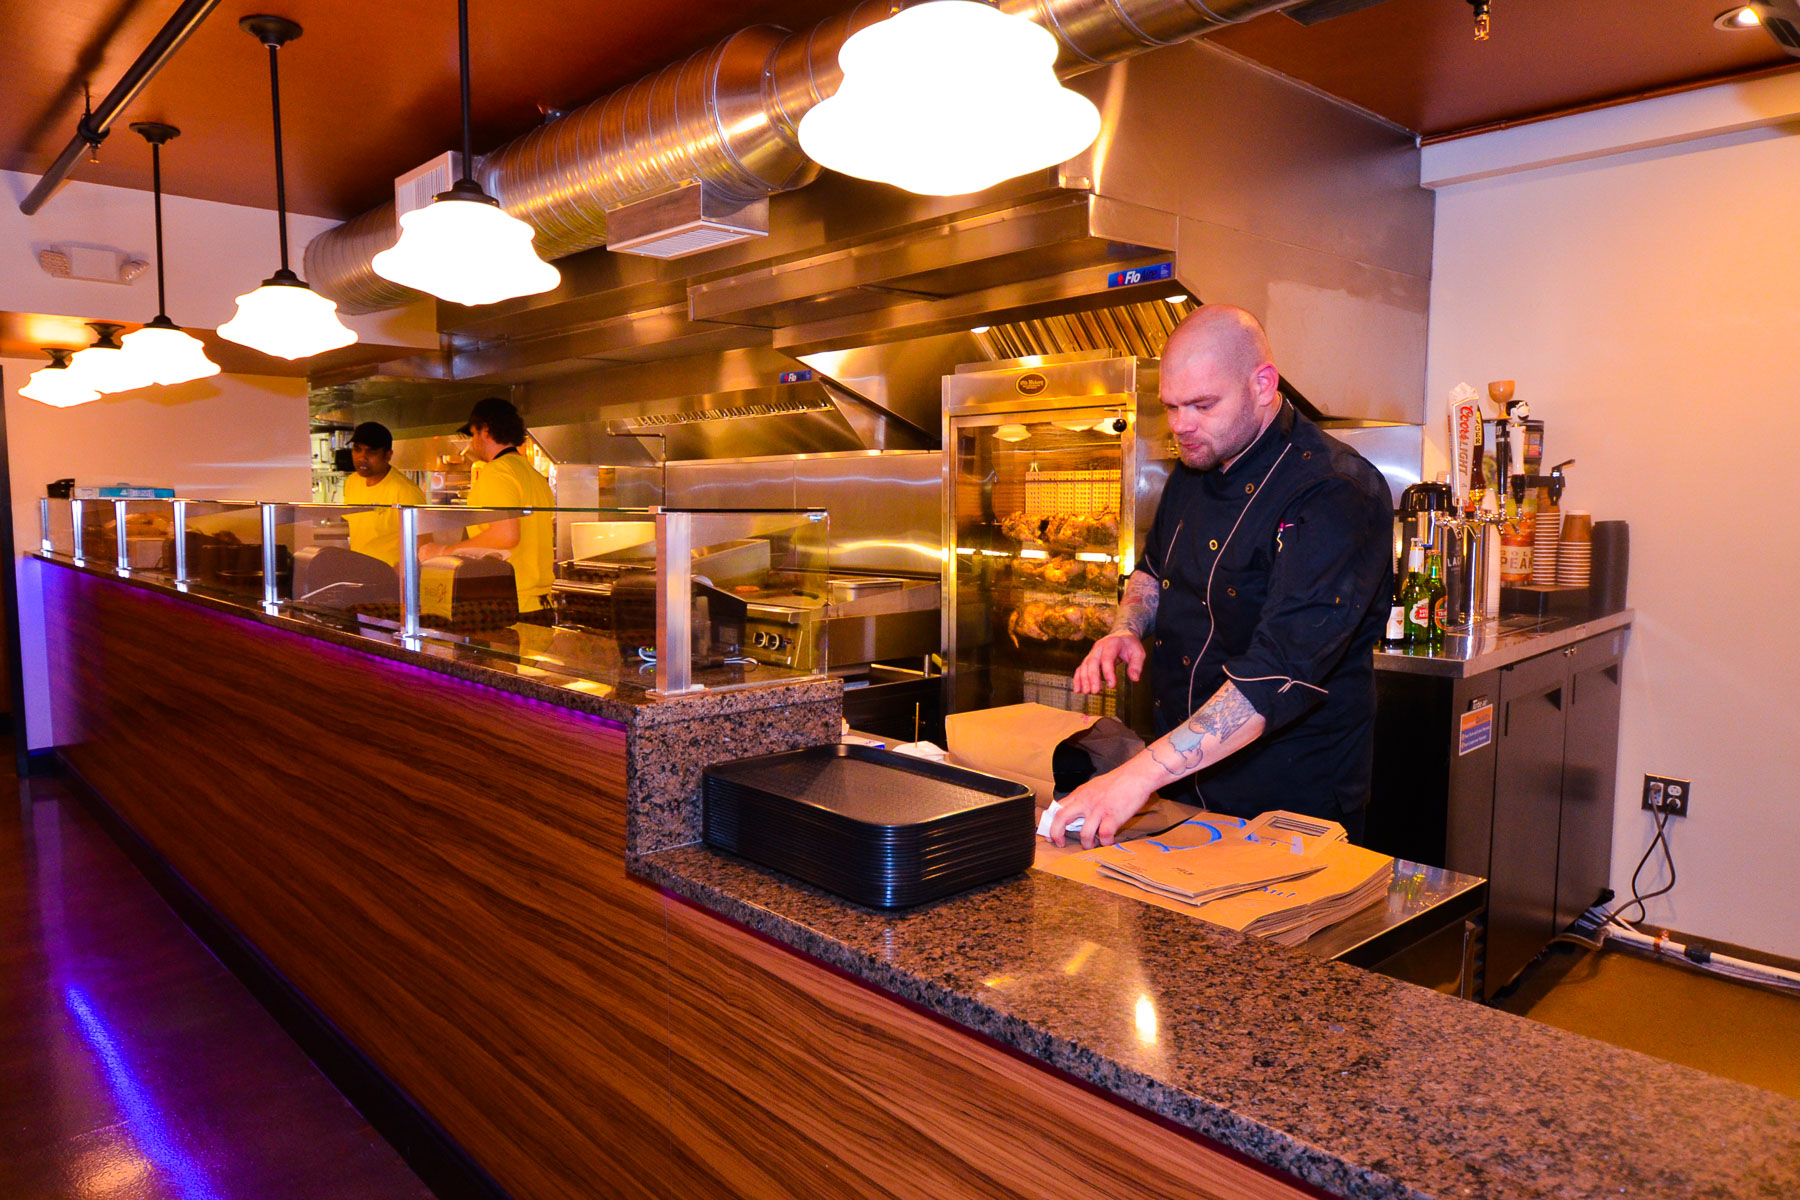 Grille Twelve 24 – Mount Vernon Eatery